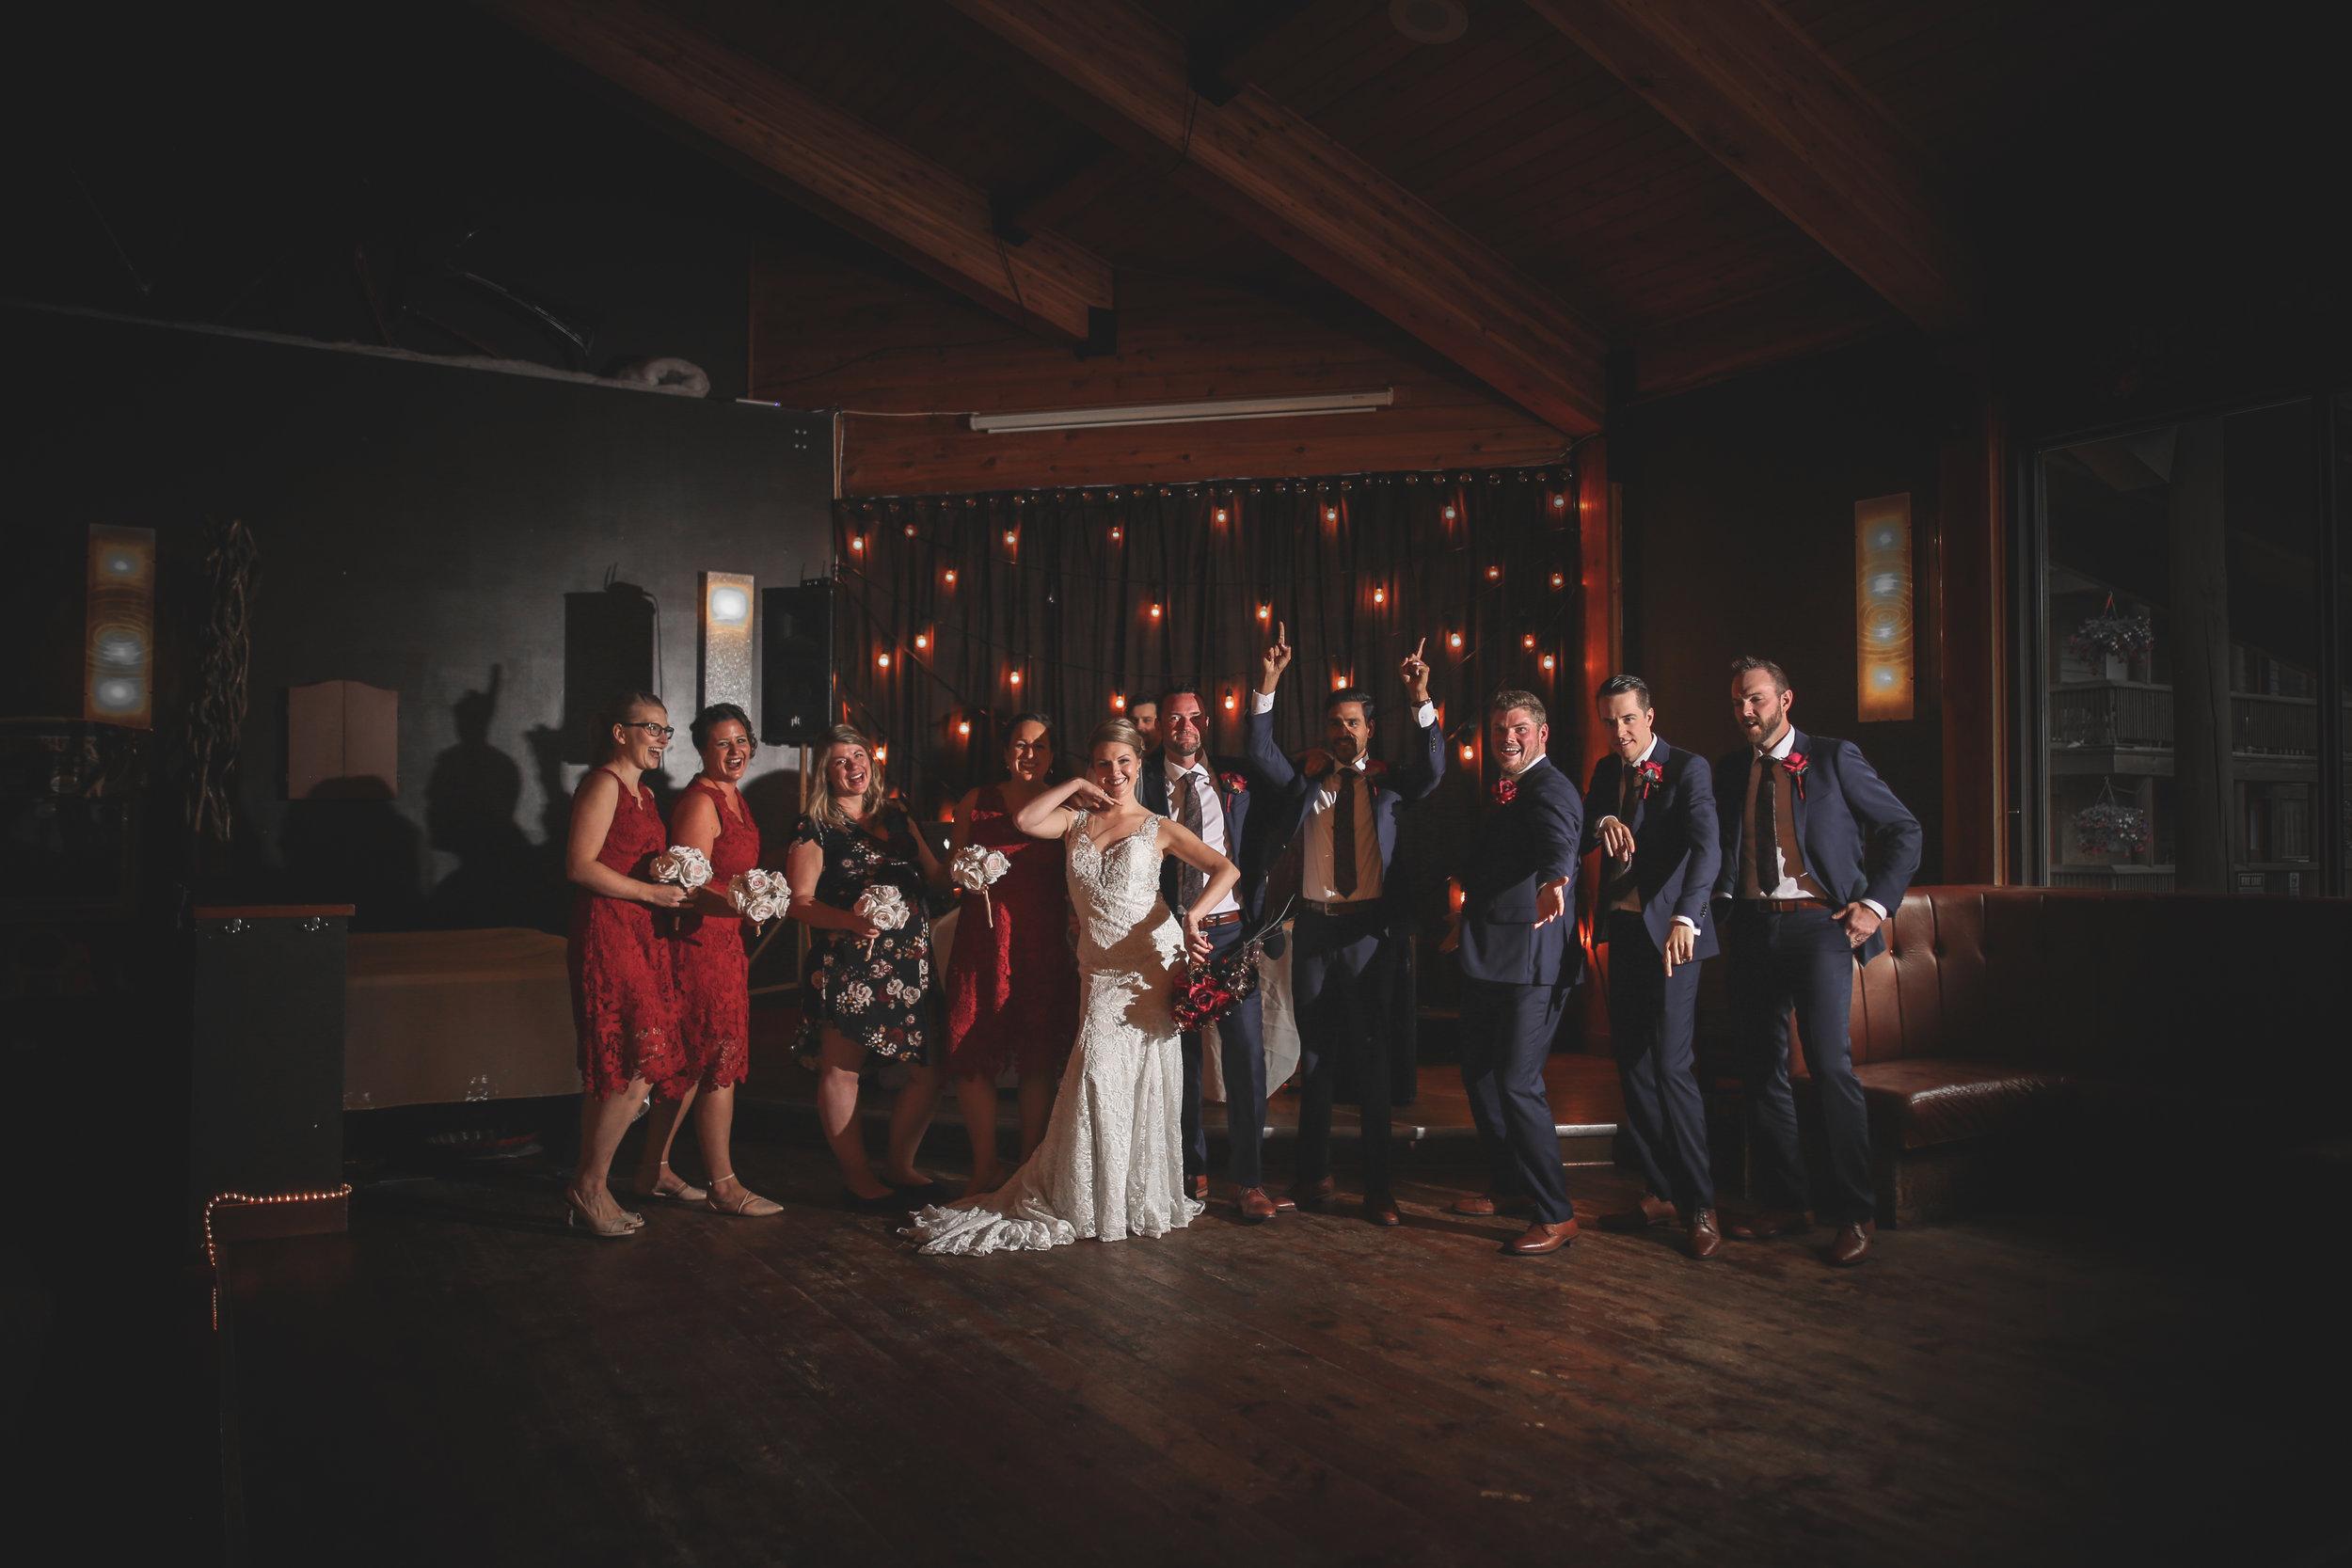 59 Adam Ziorio Photography - Vitoria wedding photographer Nick&Bree Fernie Wedding.jpg